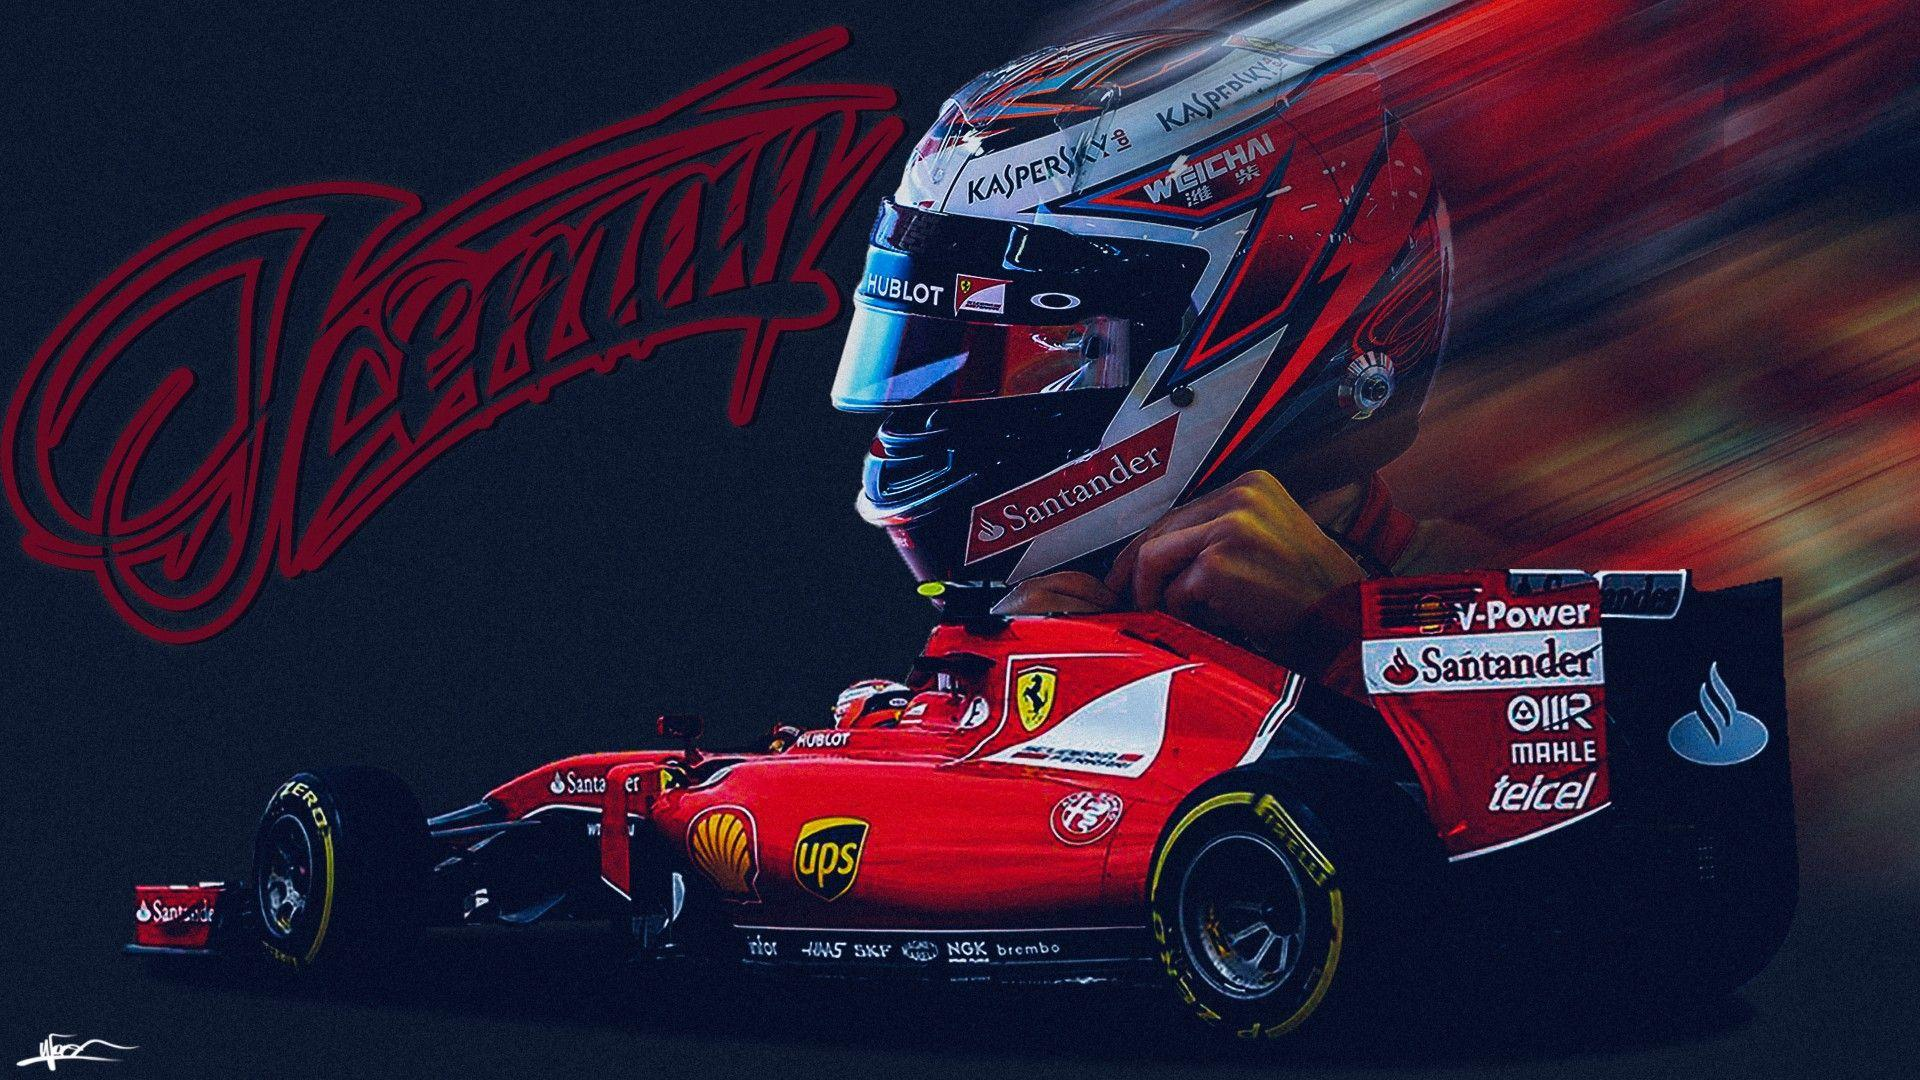 Kimi Raikkonen Ferrari Wallpapers Wallpaper Cave